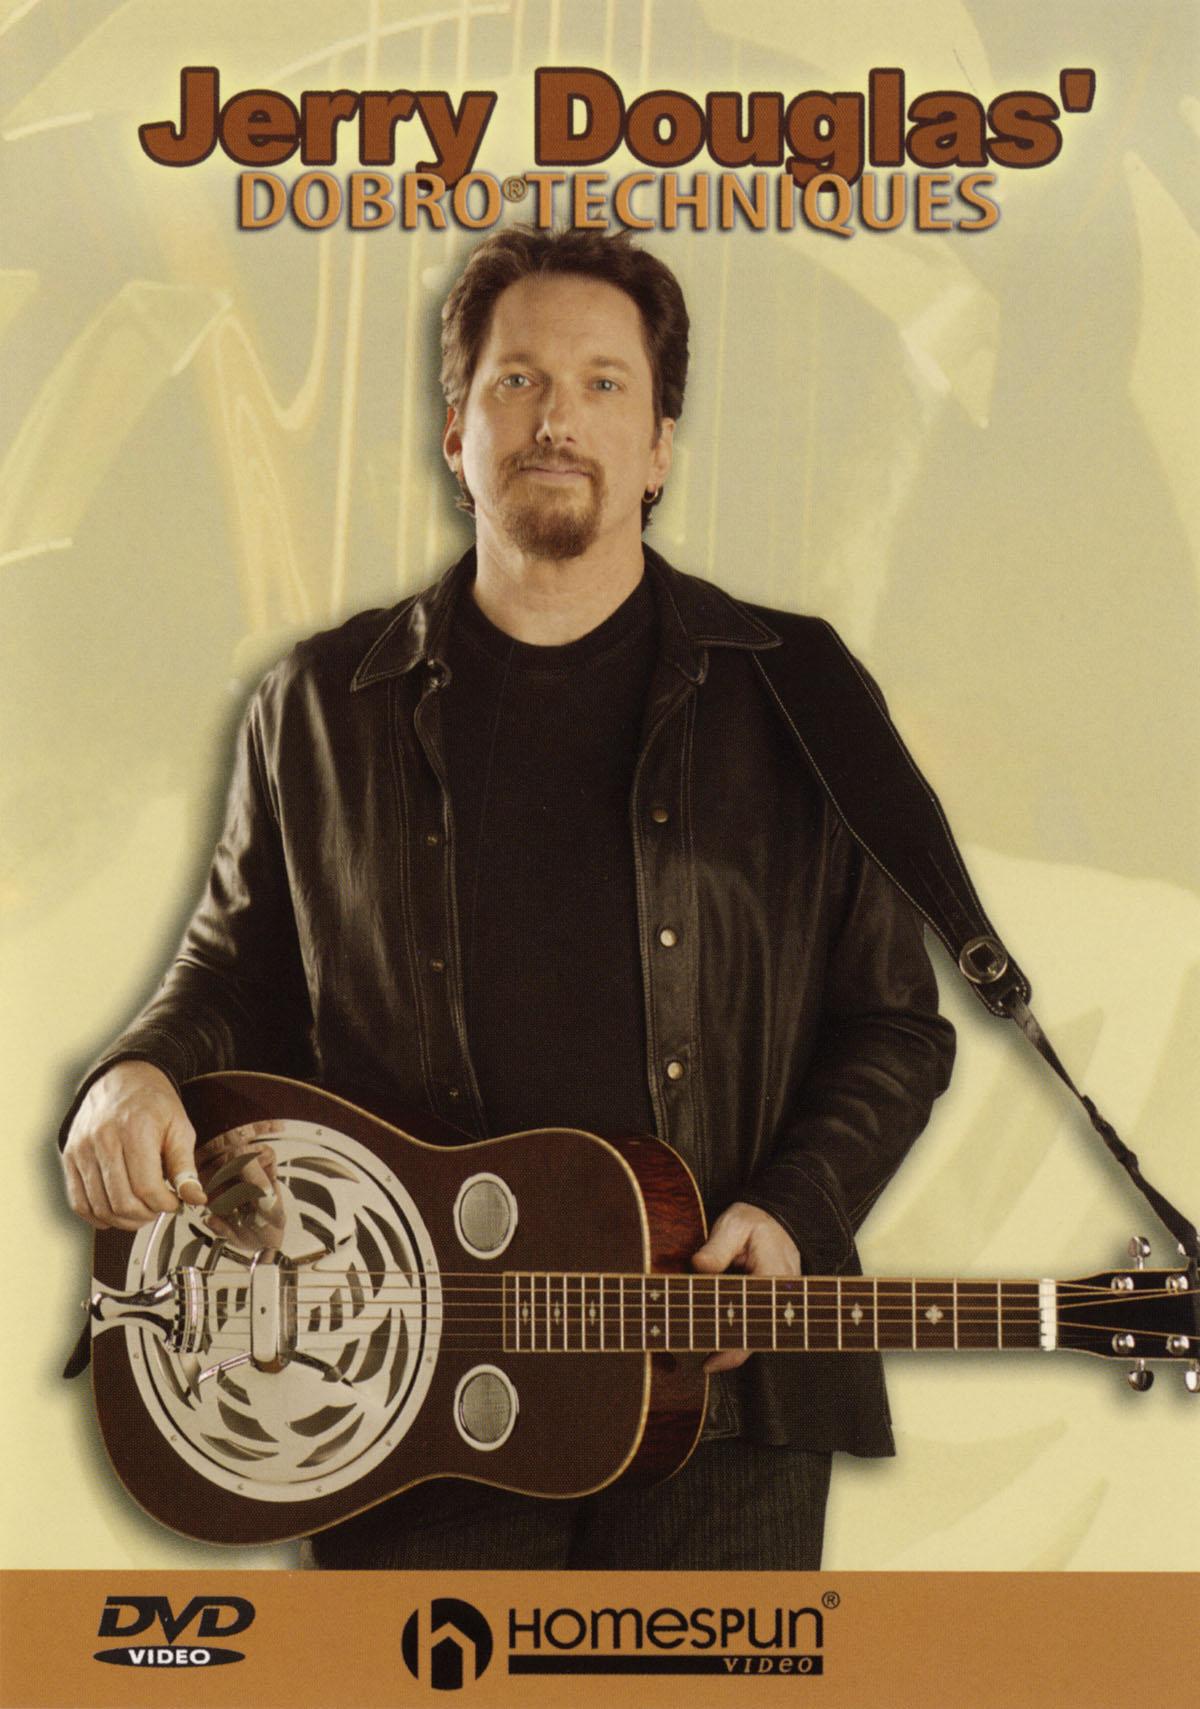 Jerry Douglas: Jerry Douglas' Dobro« Techniques: Guitar Solo: Instrumental Tutor